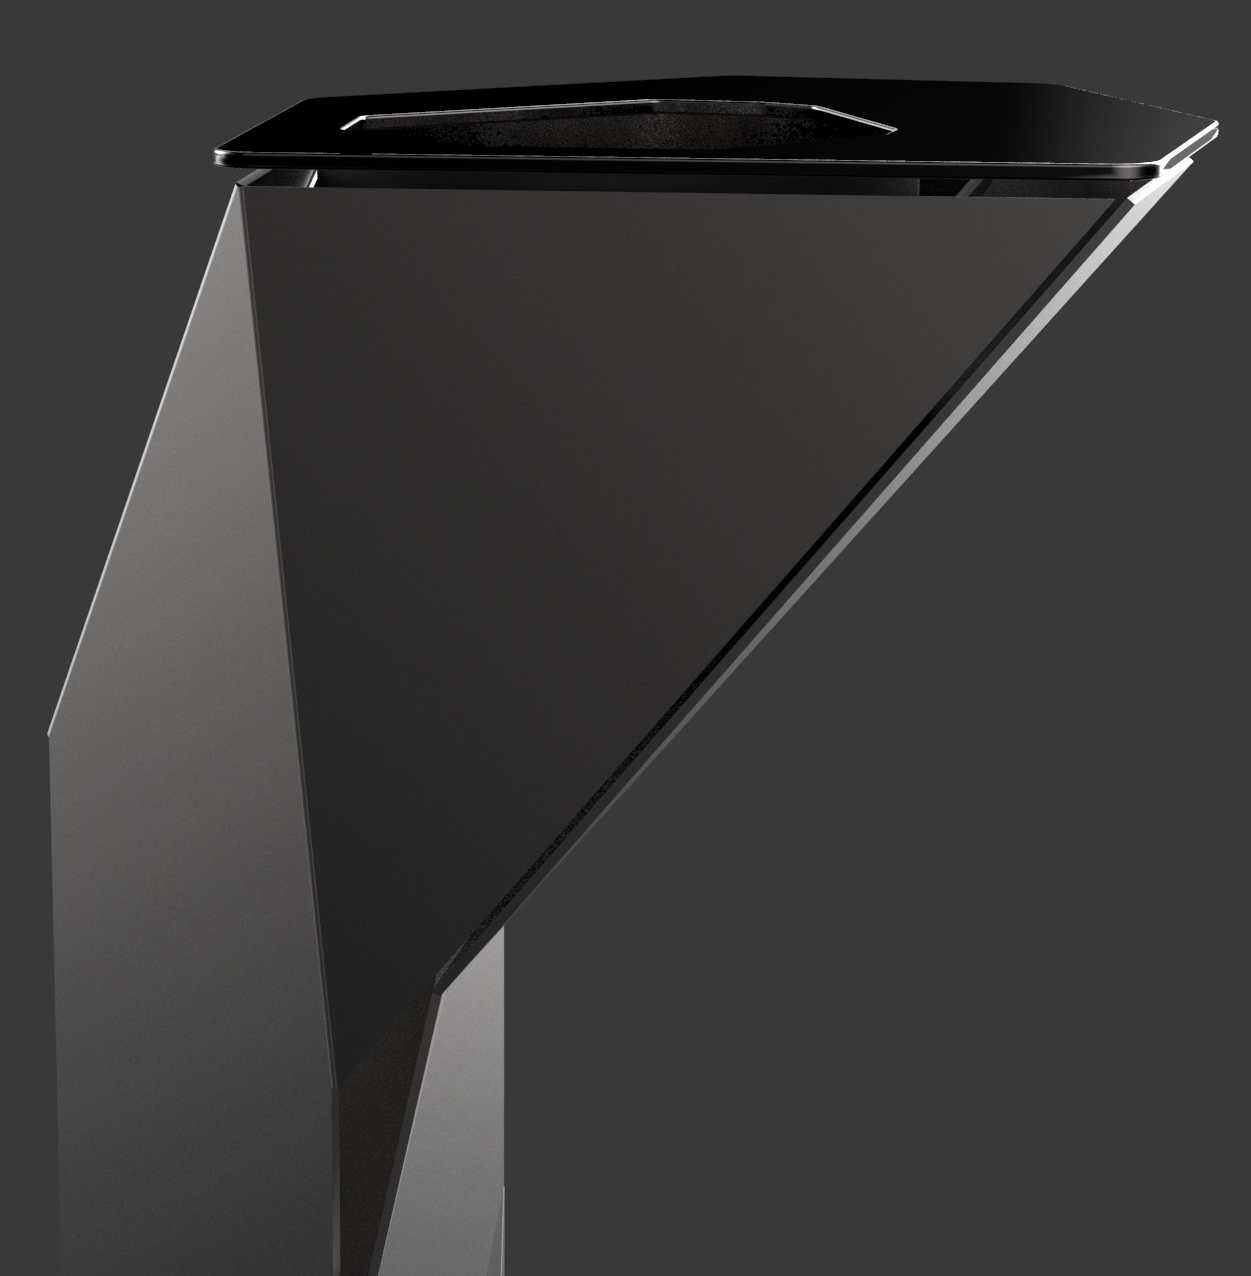 cendrier objets publics design franck magné mobilier urbain cendrier à sable street furniture design